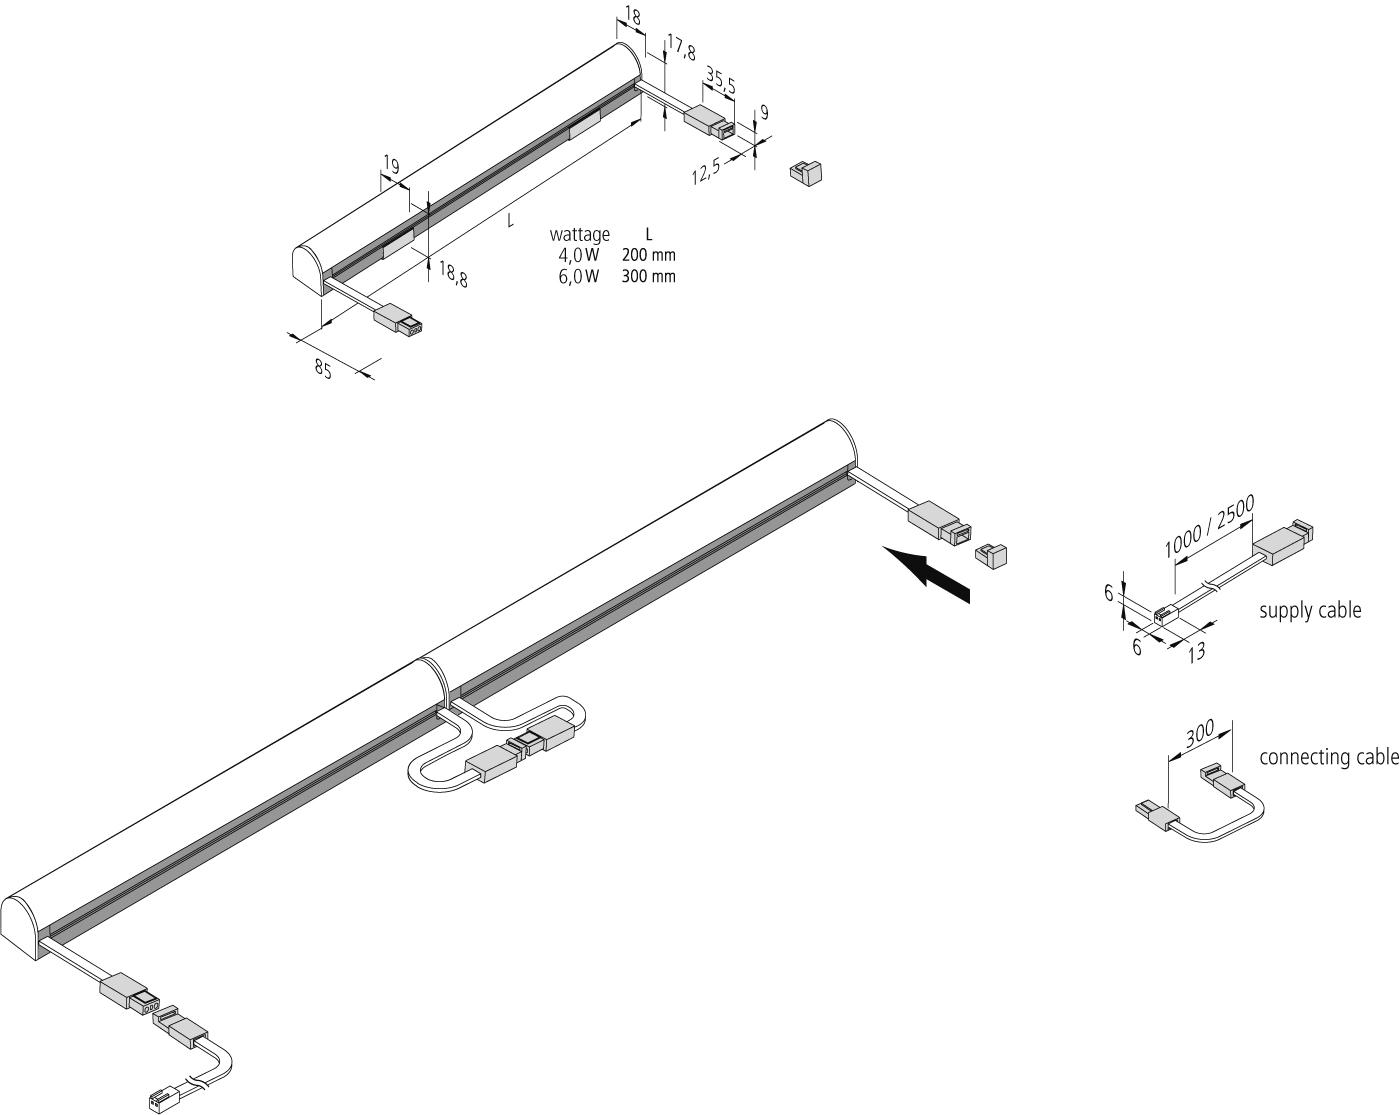 Preview: LED-Evo-Stick-F_3D_en